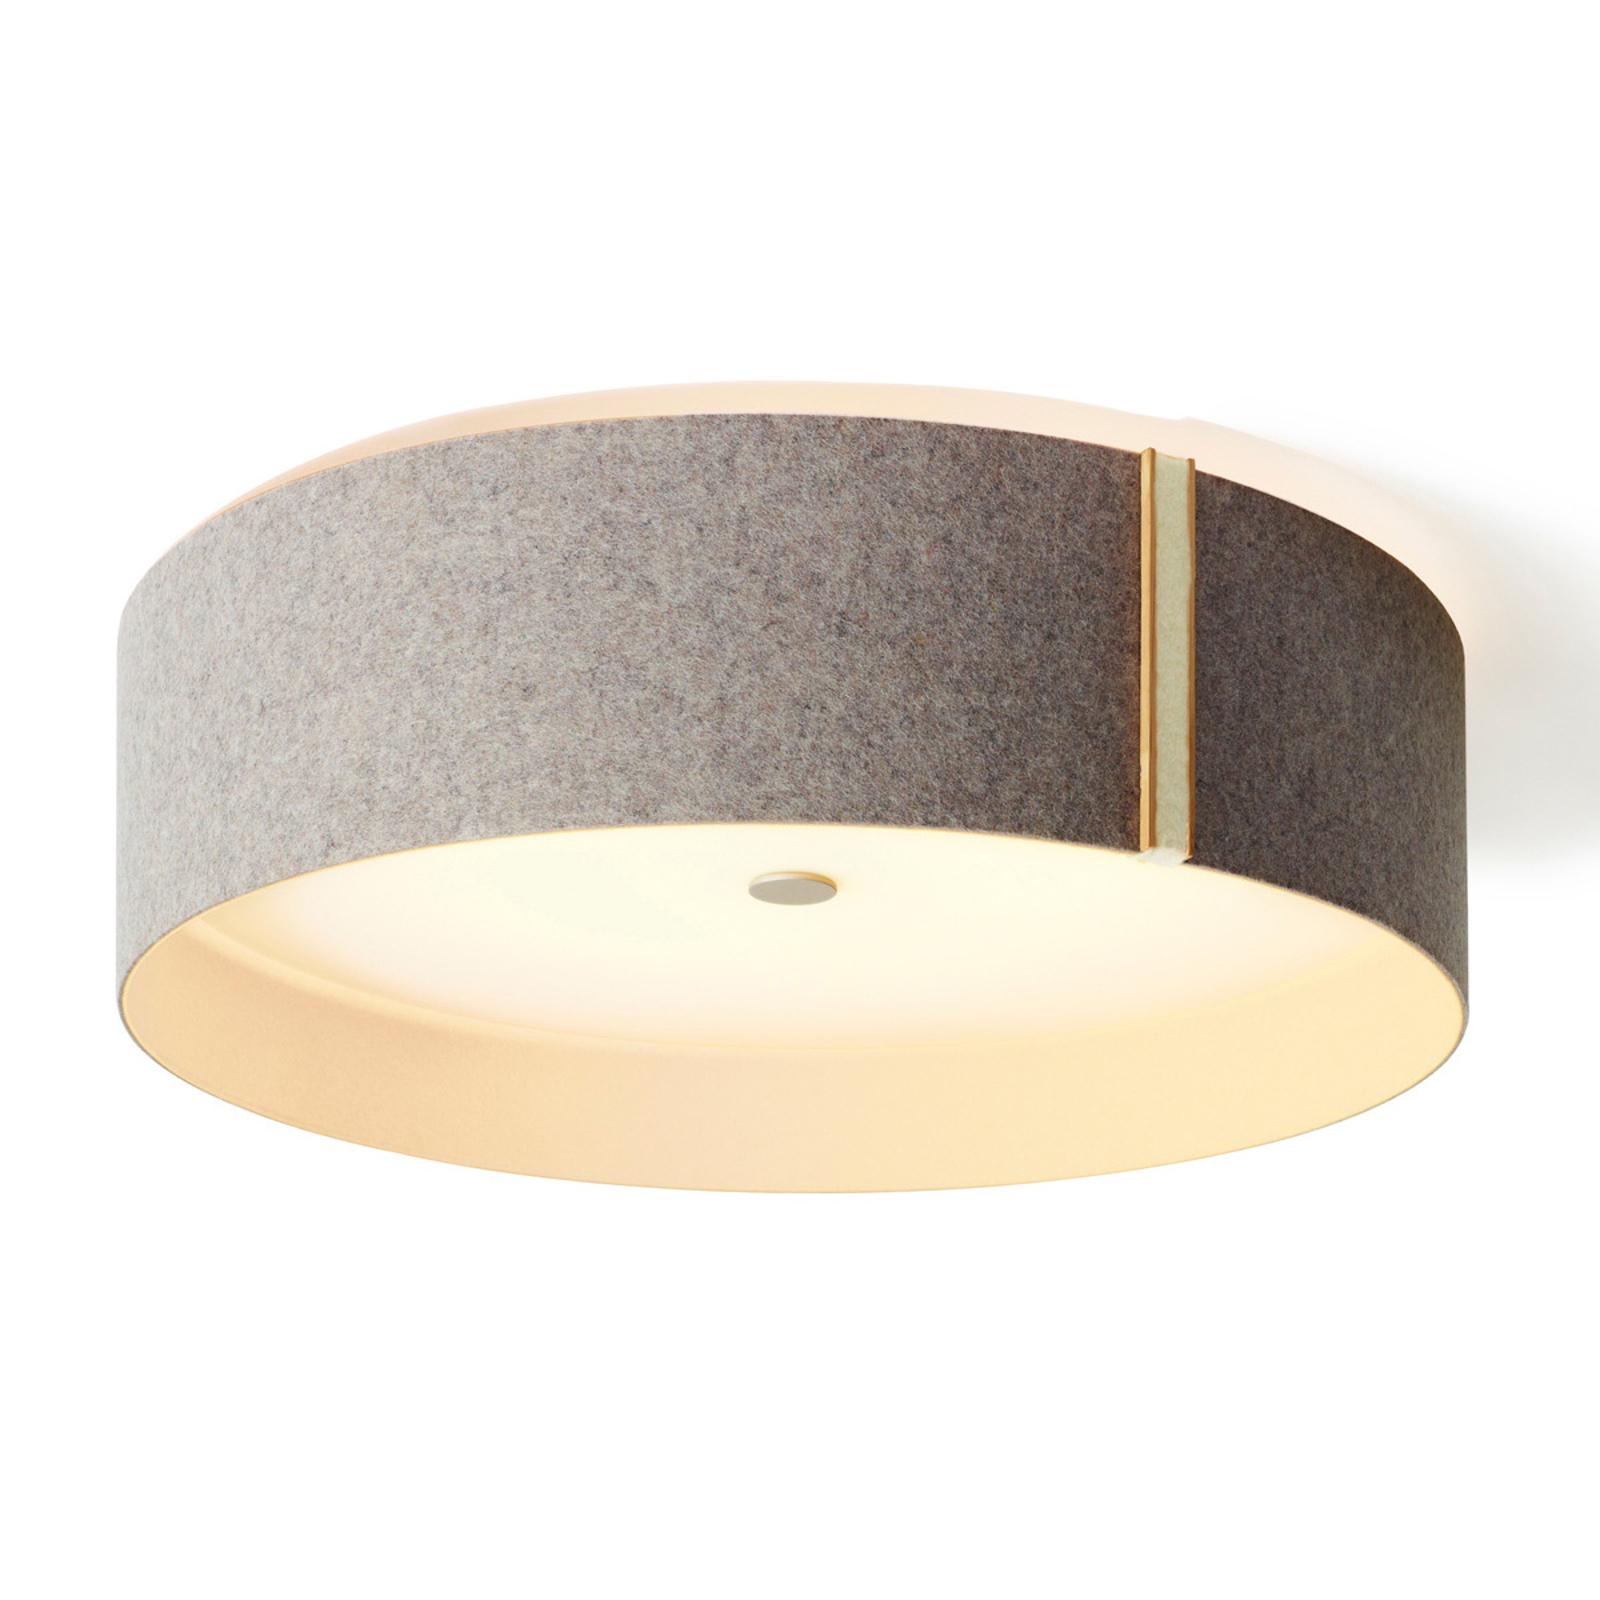 Plstené stropné svietidlo Lara felt LED sivo-biela_2600507_1